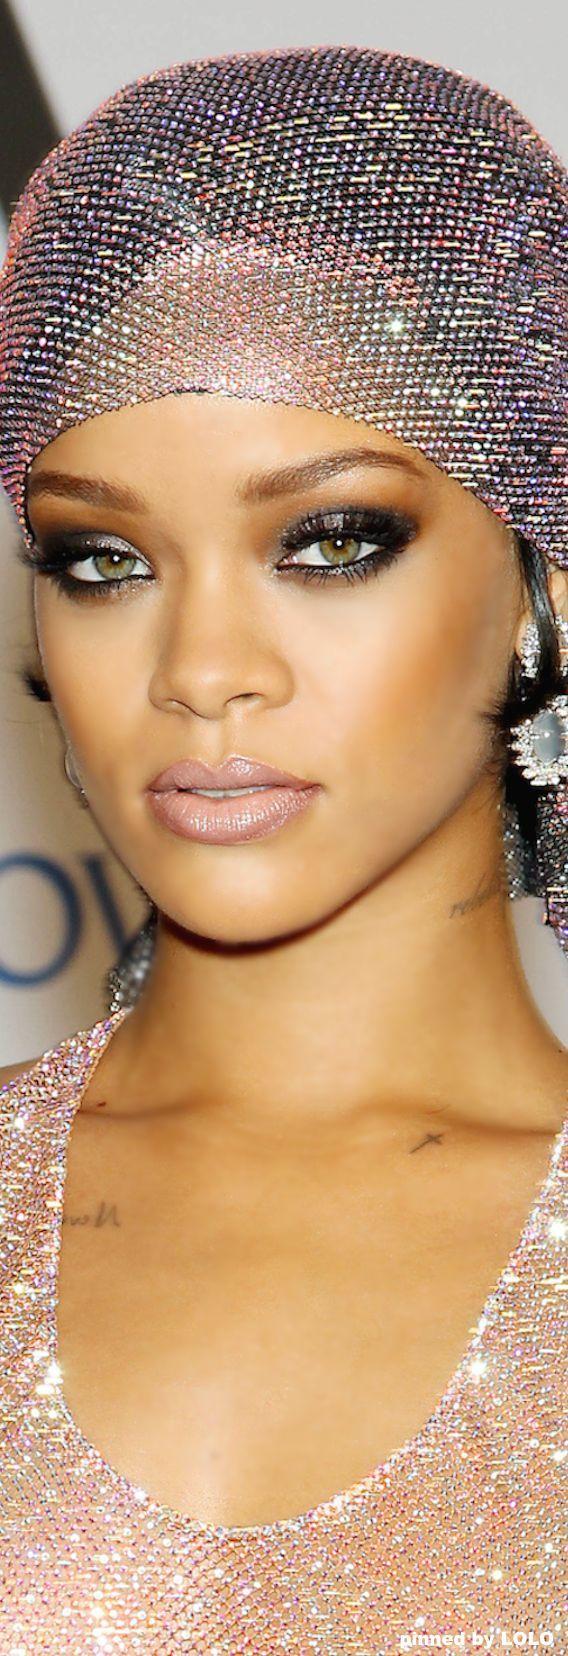 RIHANNA at CFDA Fashion Awards in New York Rihanna